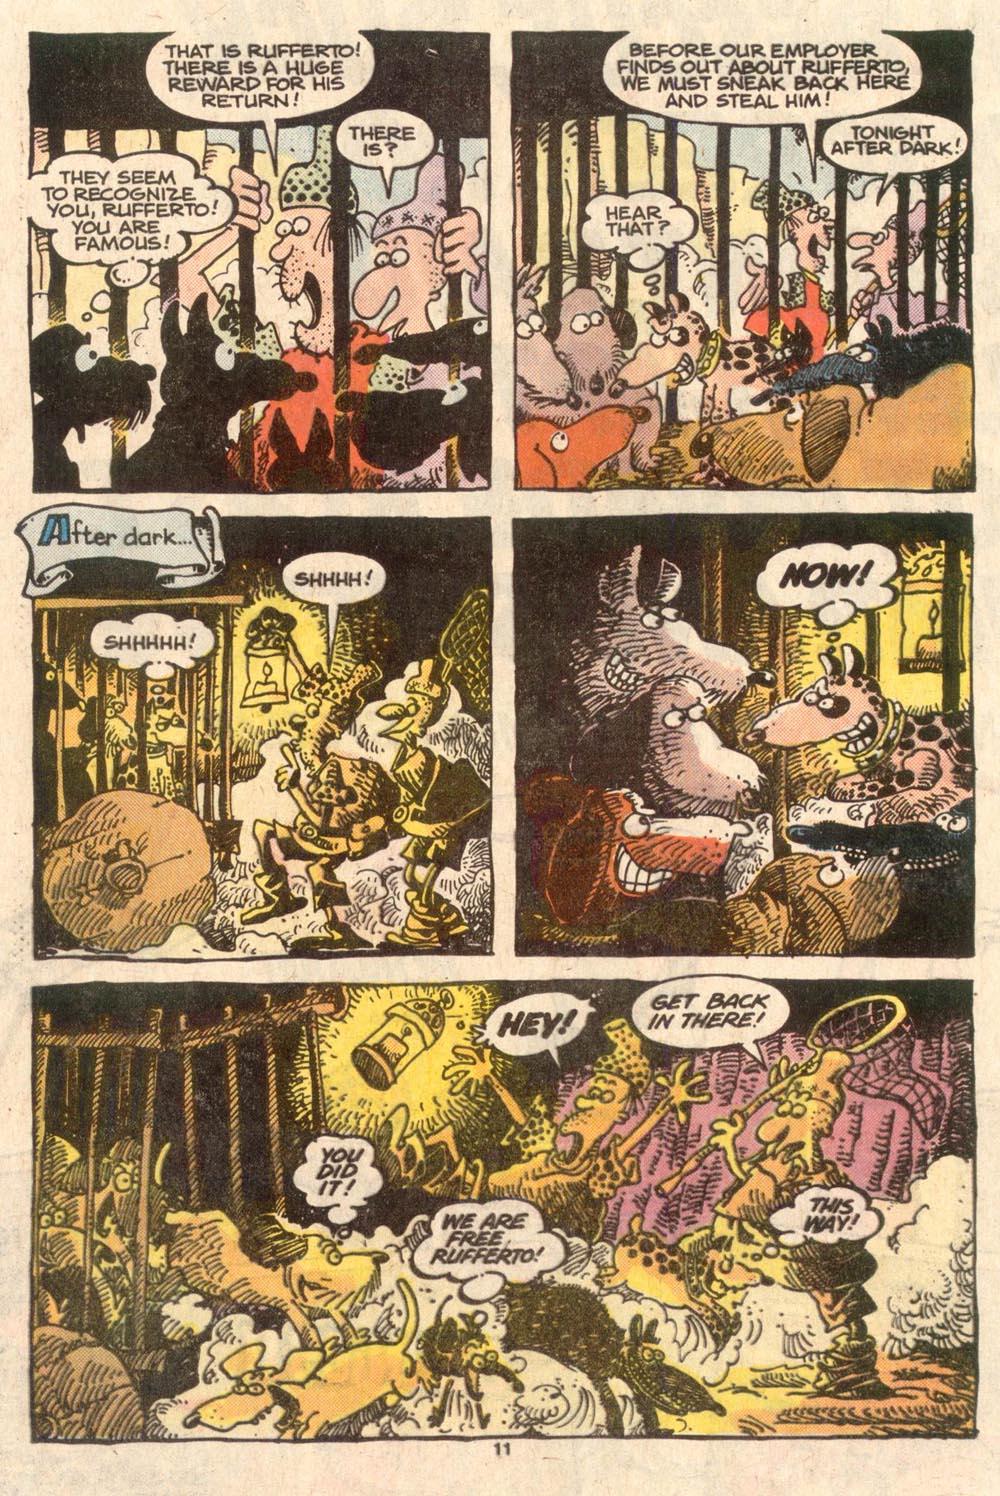 Read online Sergio Aragonés Groo the Wanderer comic -  Issue #45 - 11